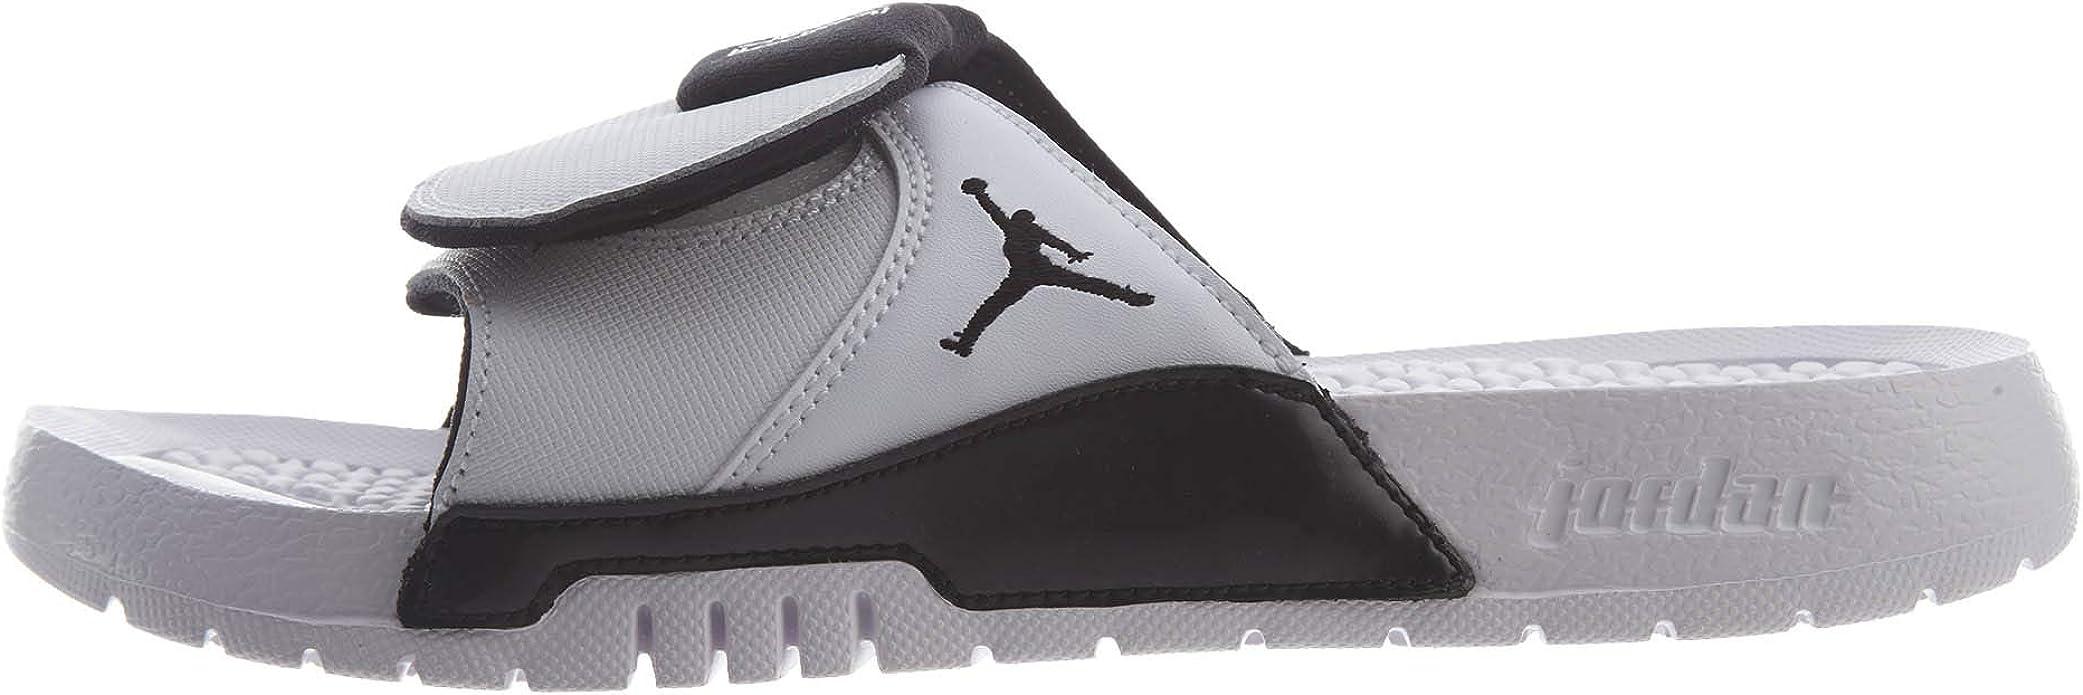 Nike Jordan Hydro XIII Retro Slide, 7Y